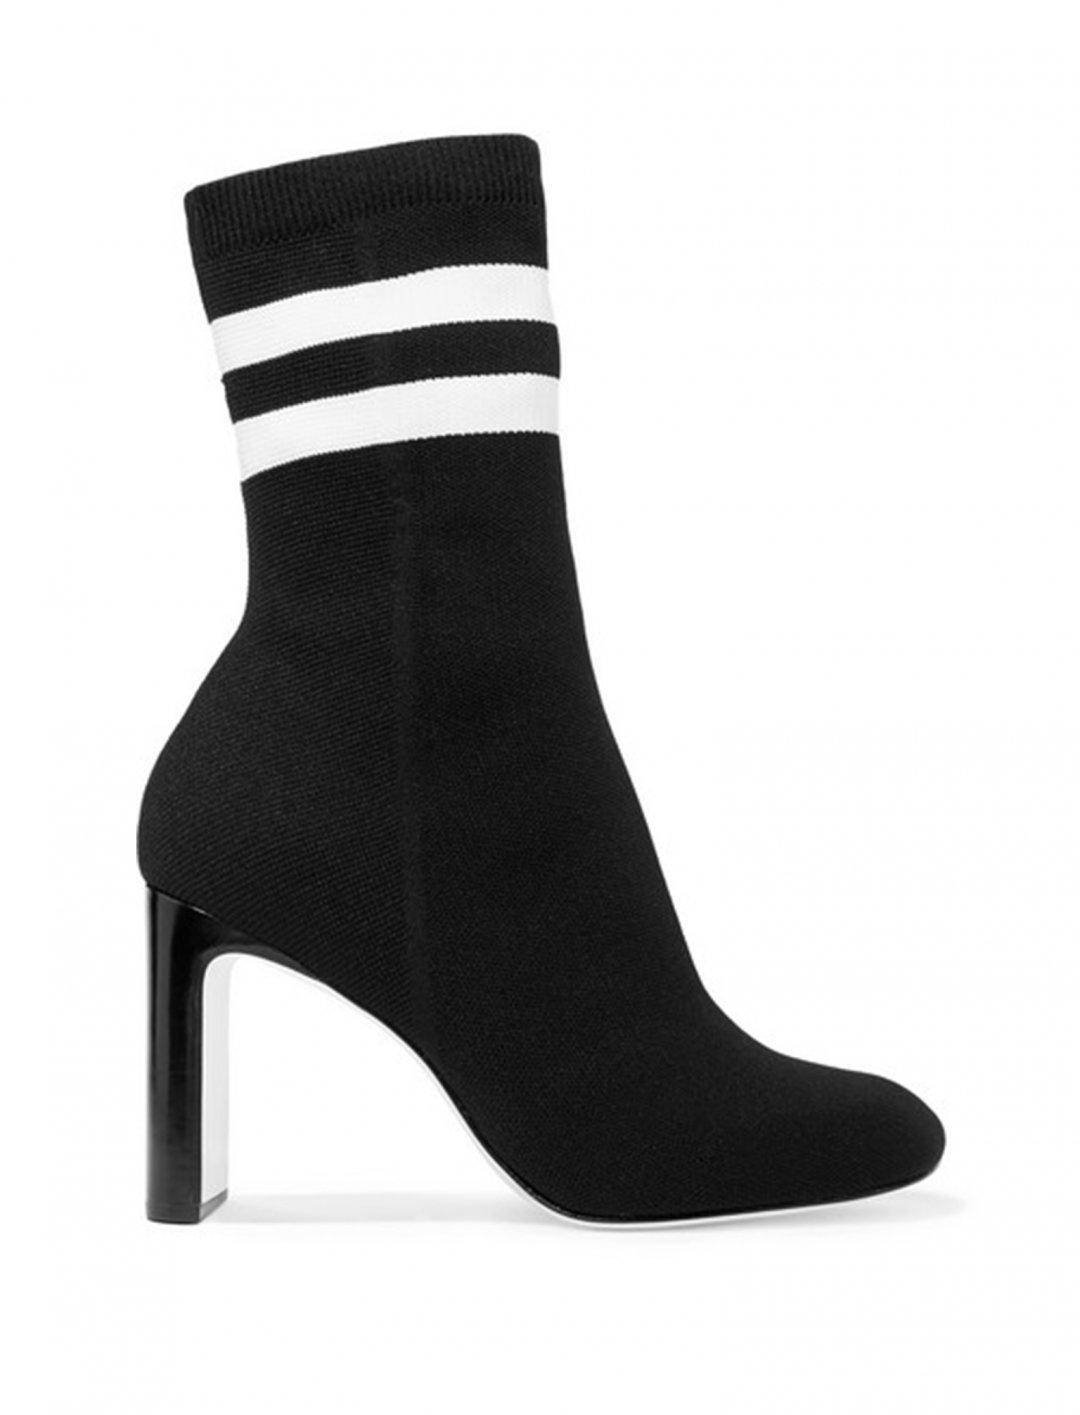 Raja Kumari's Sock Boots Shoes Rag & Bone